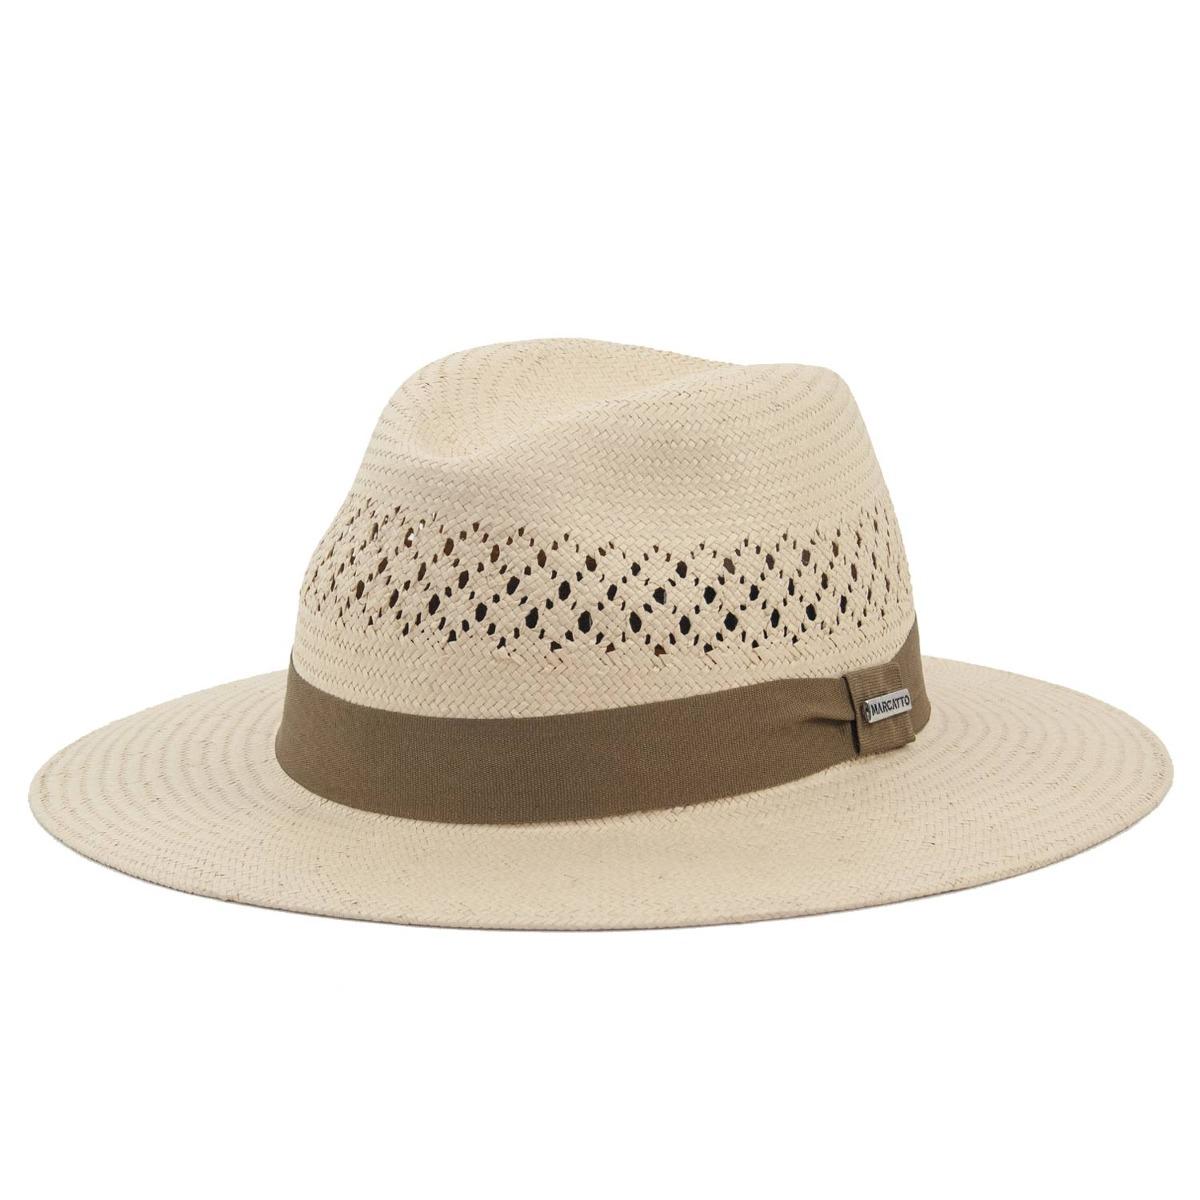 eac5607884577 chapéu estilo panamá bege masculino feminino aba larga. Carregando zoom.